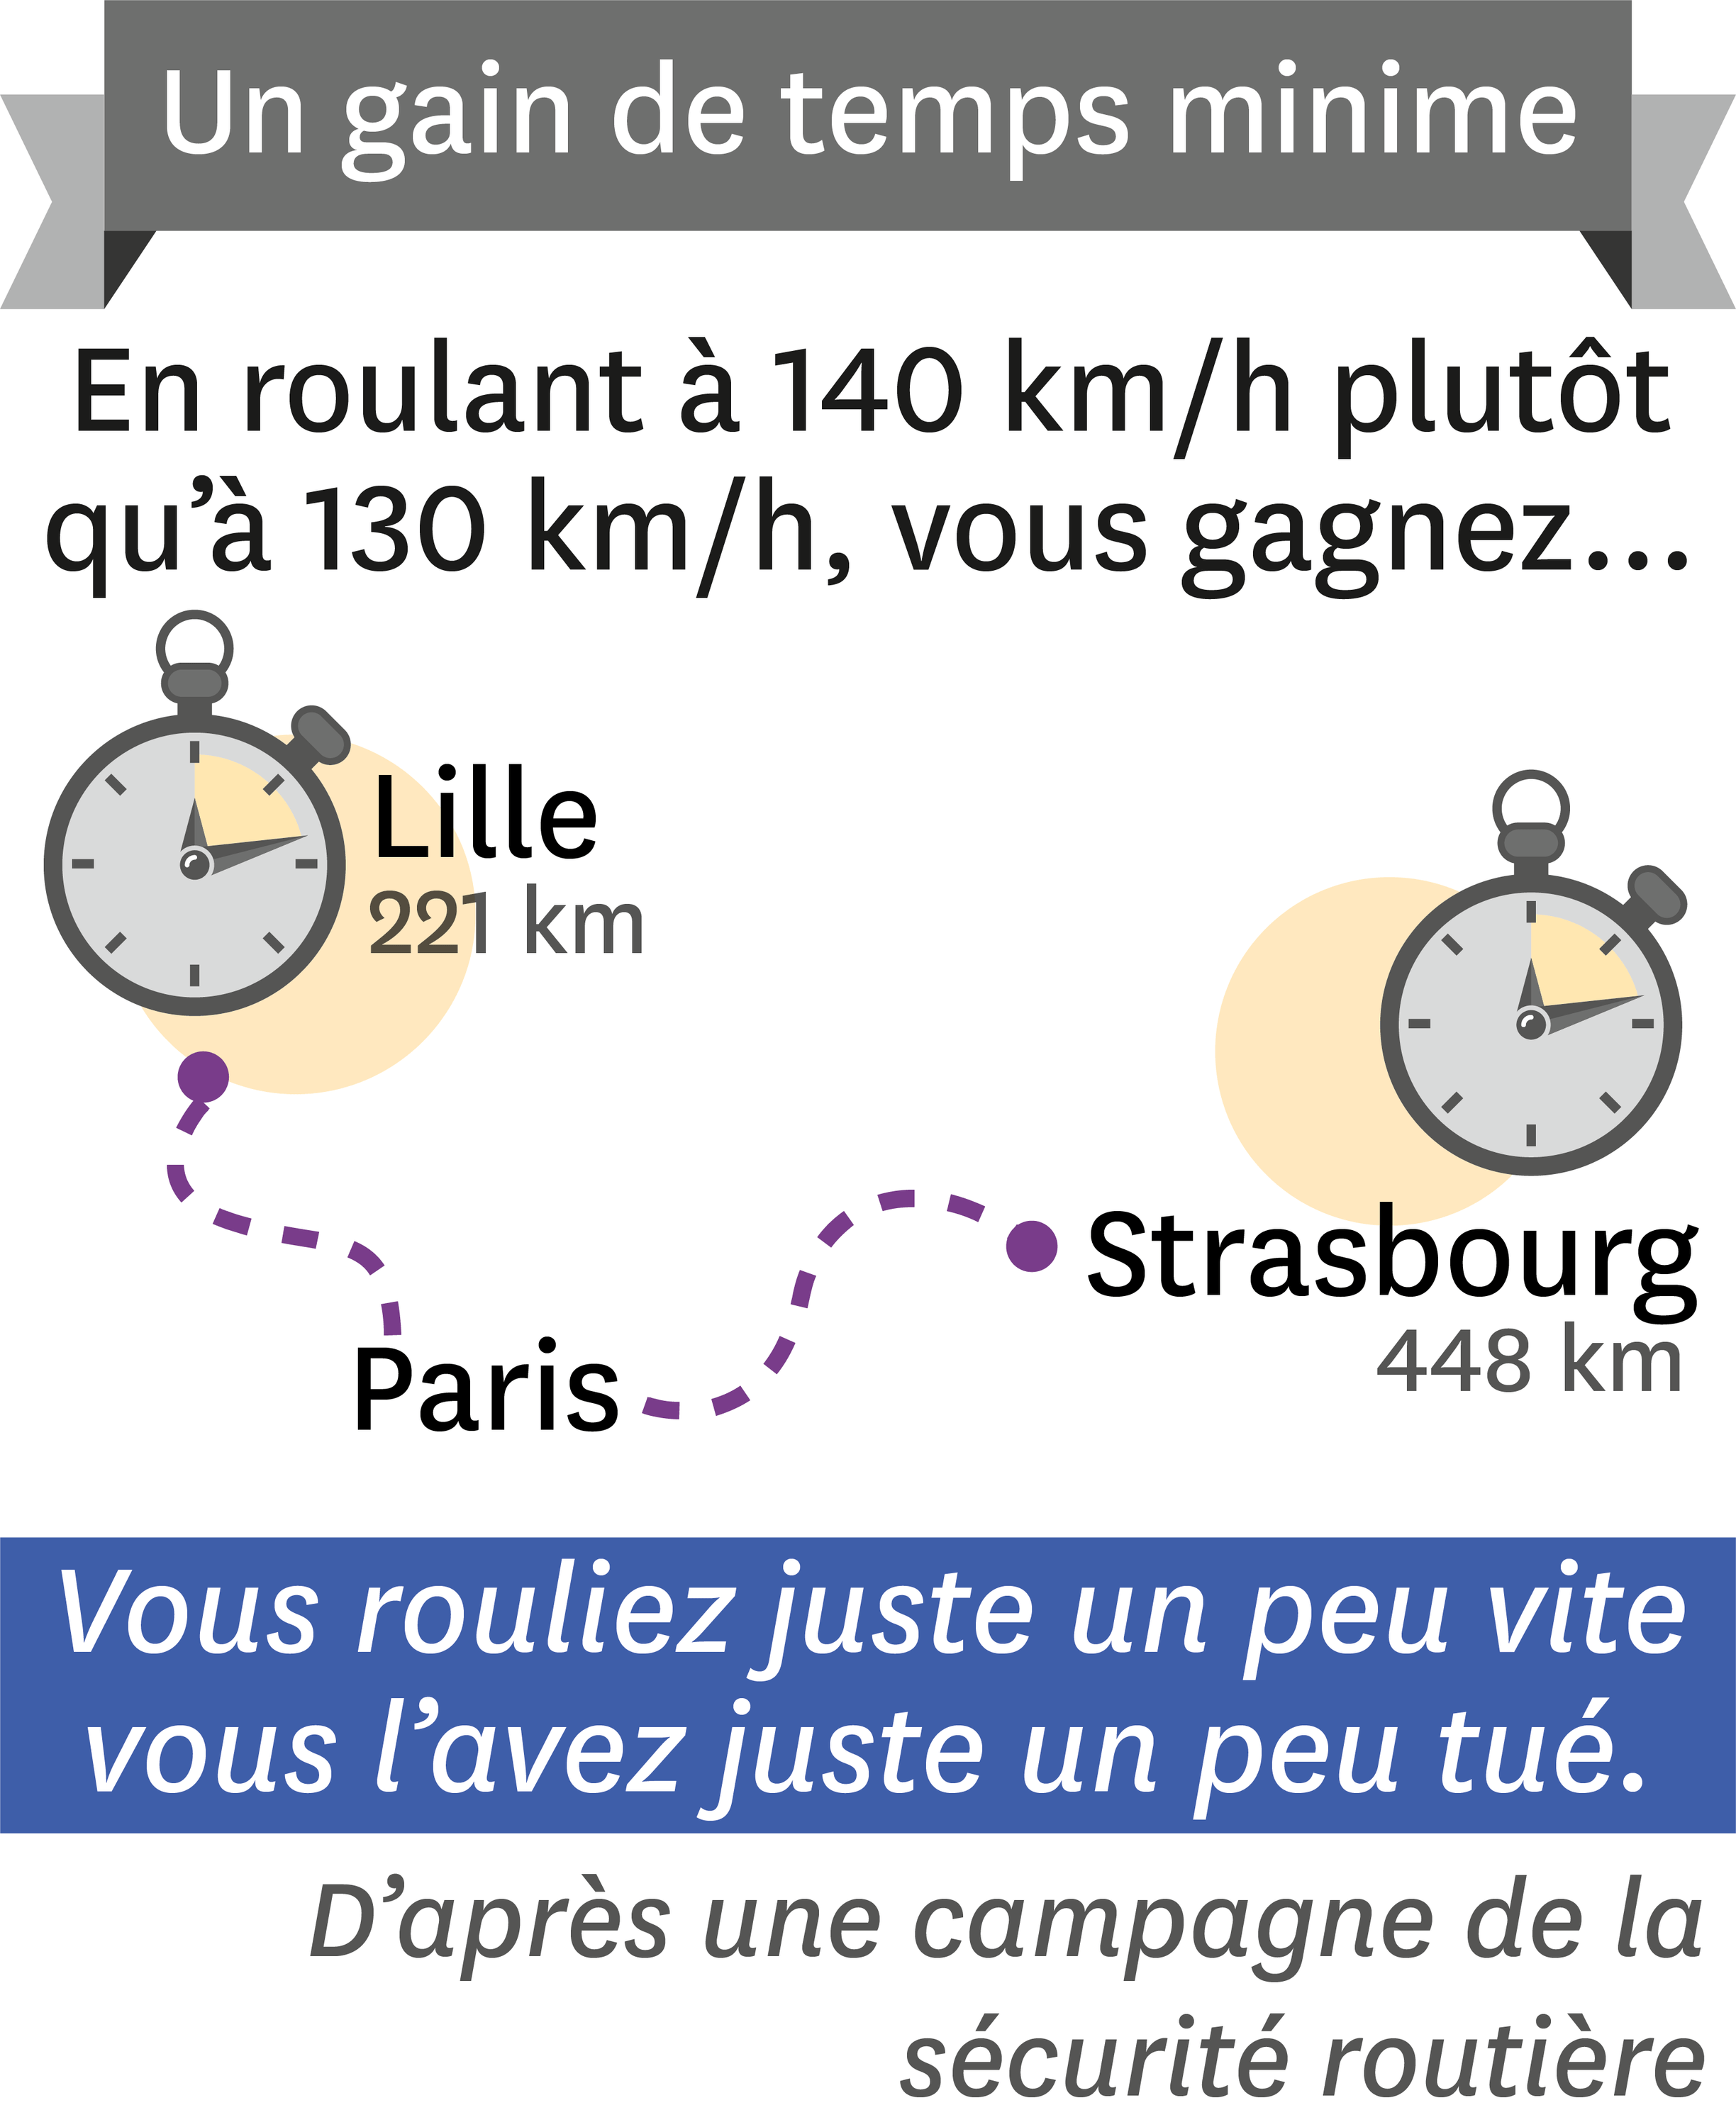 <stamp theme='pc-green1'>Doc. 3</stamp> Lille - Paris - Strasbourg.